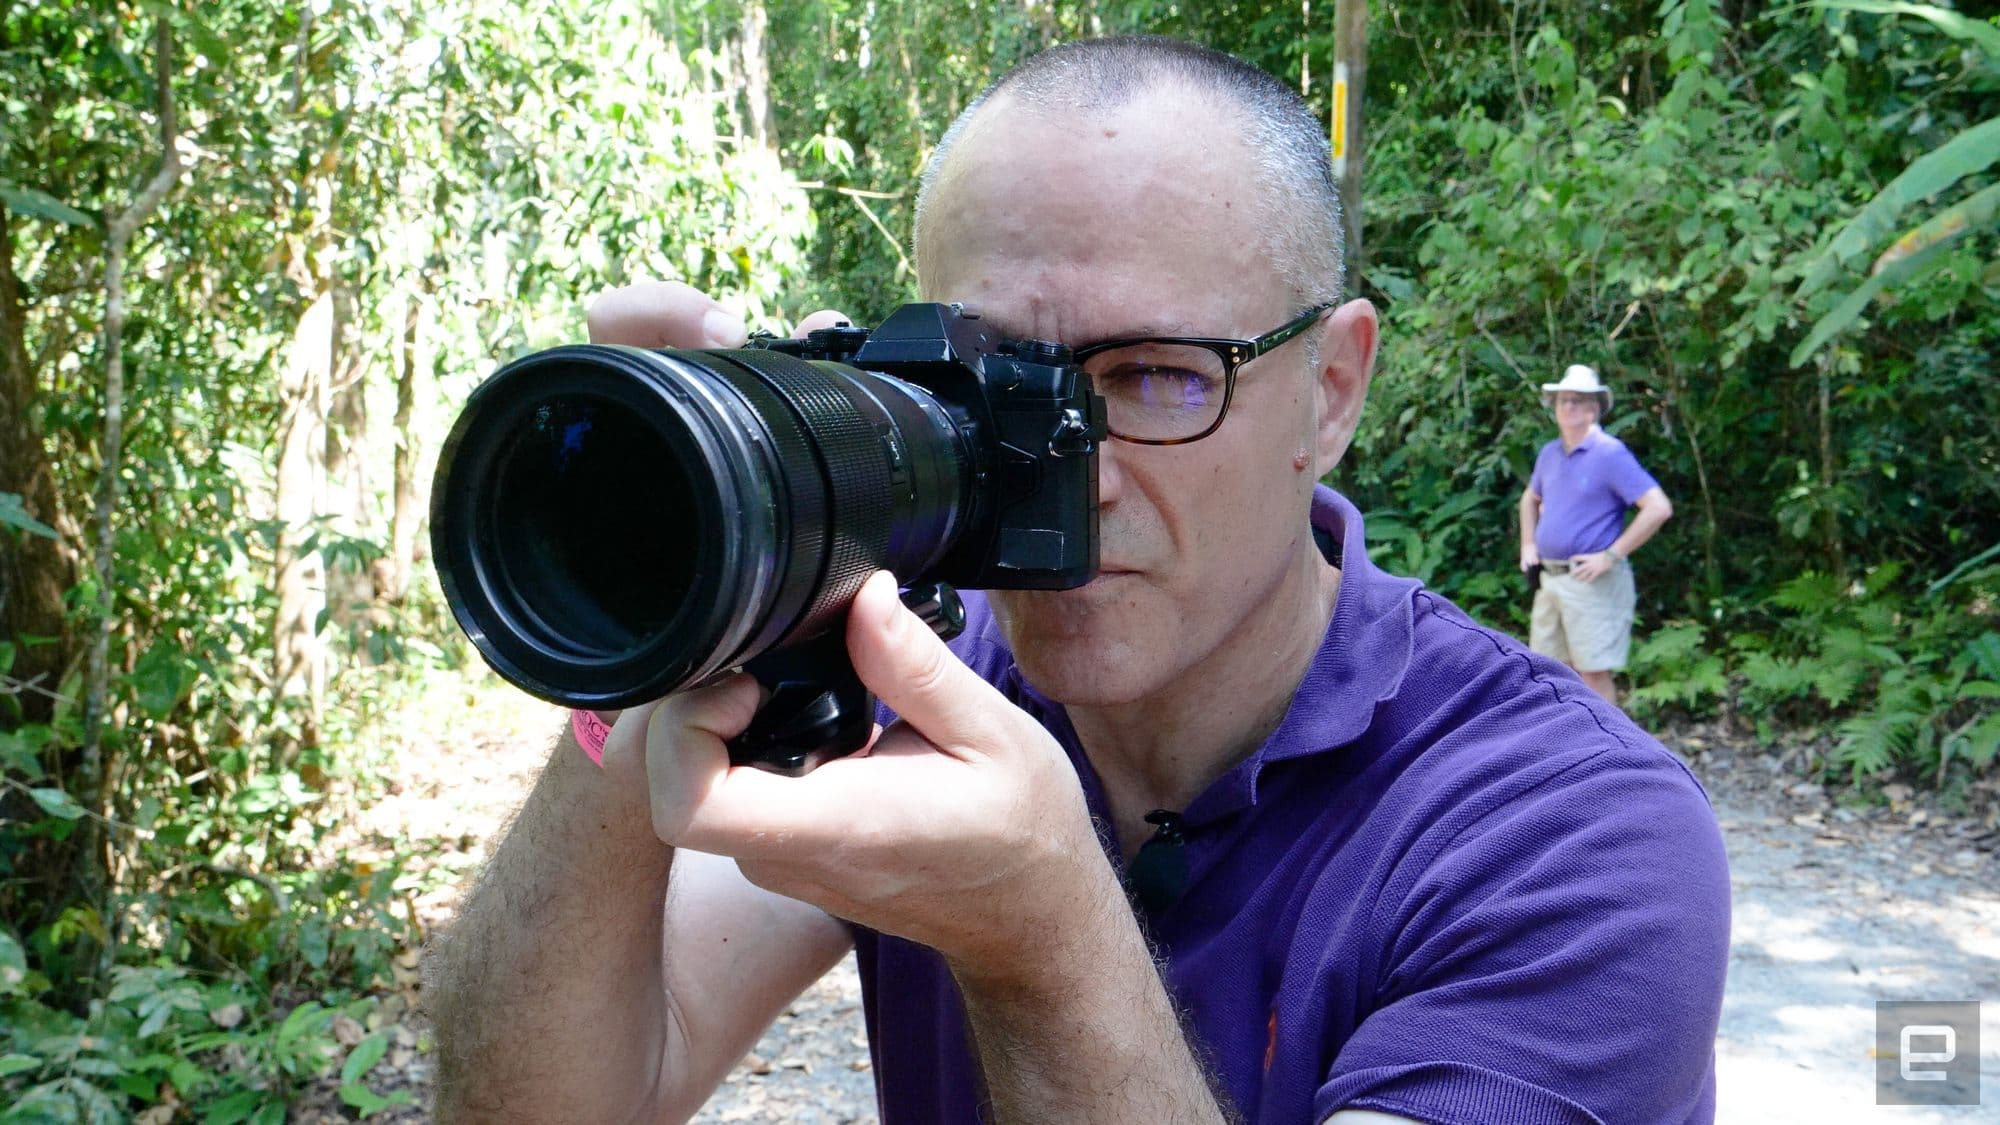 Olympus O-MD E-M1 Mark III mirrorless Micro Four Thirds camera